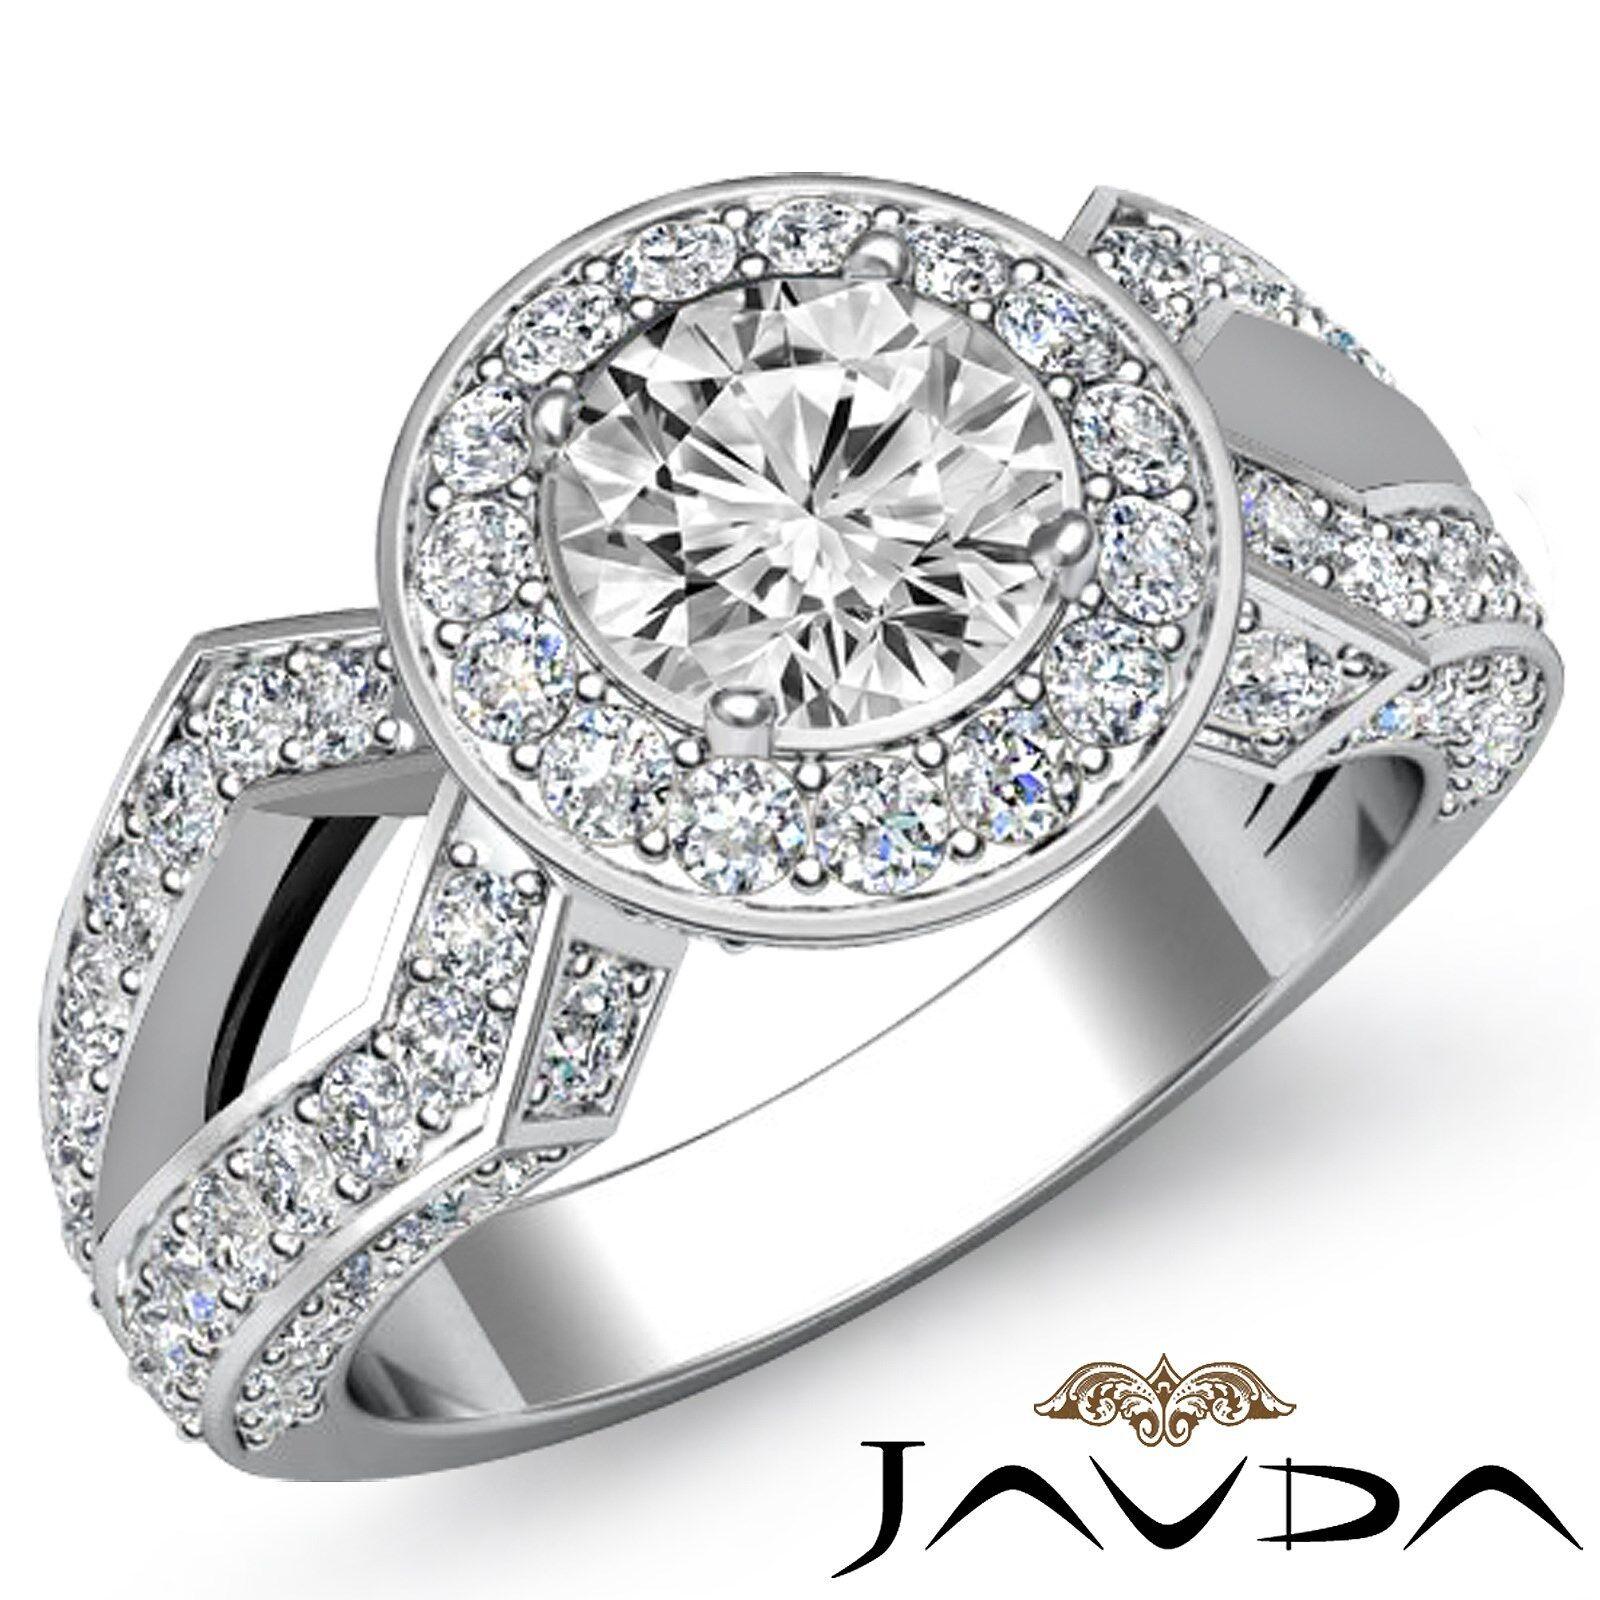 Halo Split Shank Round Diamond Engagement Filigree Ring GIA I Color SI1 2.92 Ct